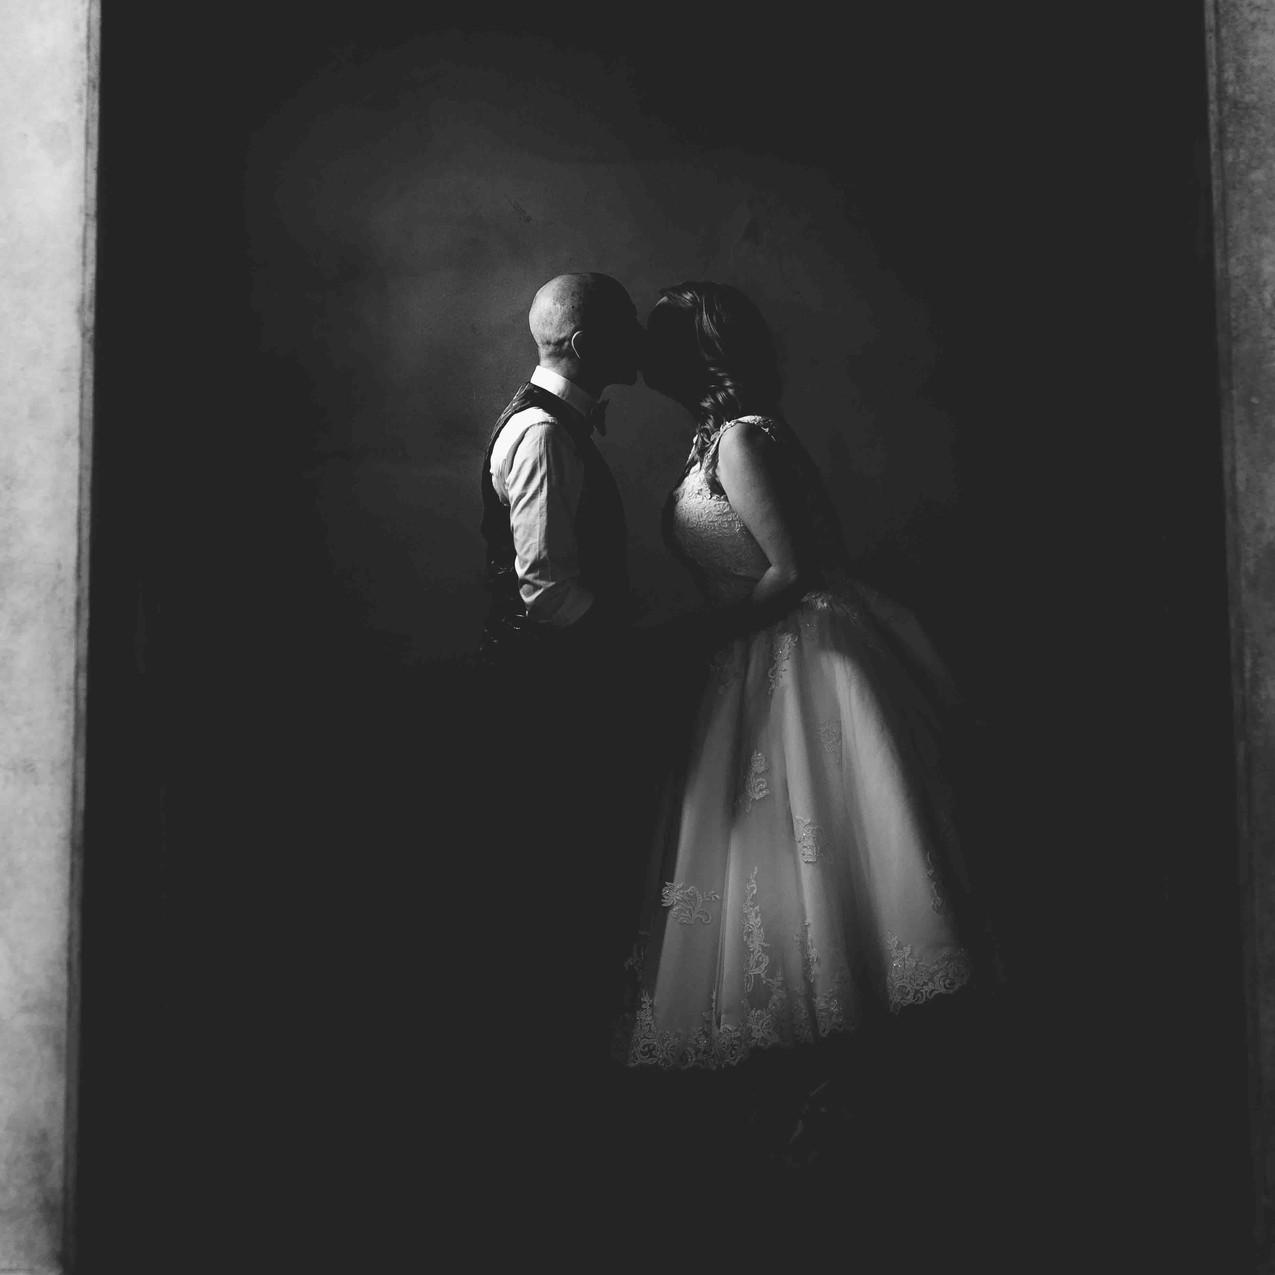 Creative wedding portraiture